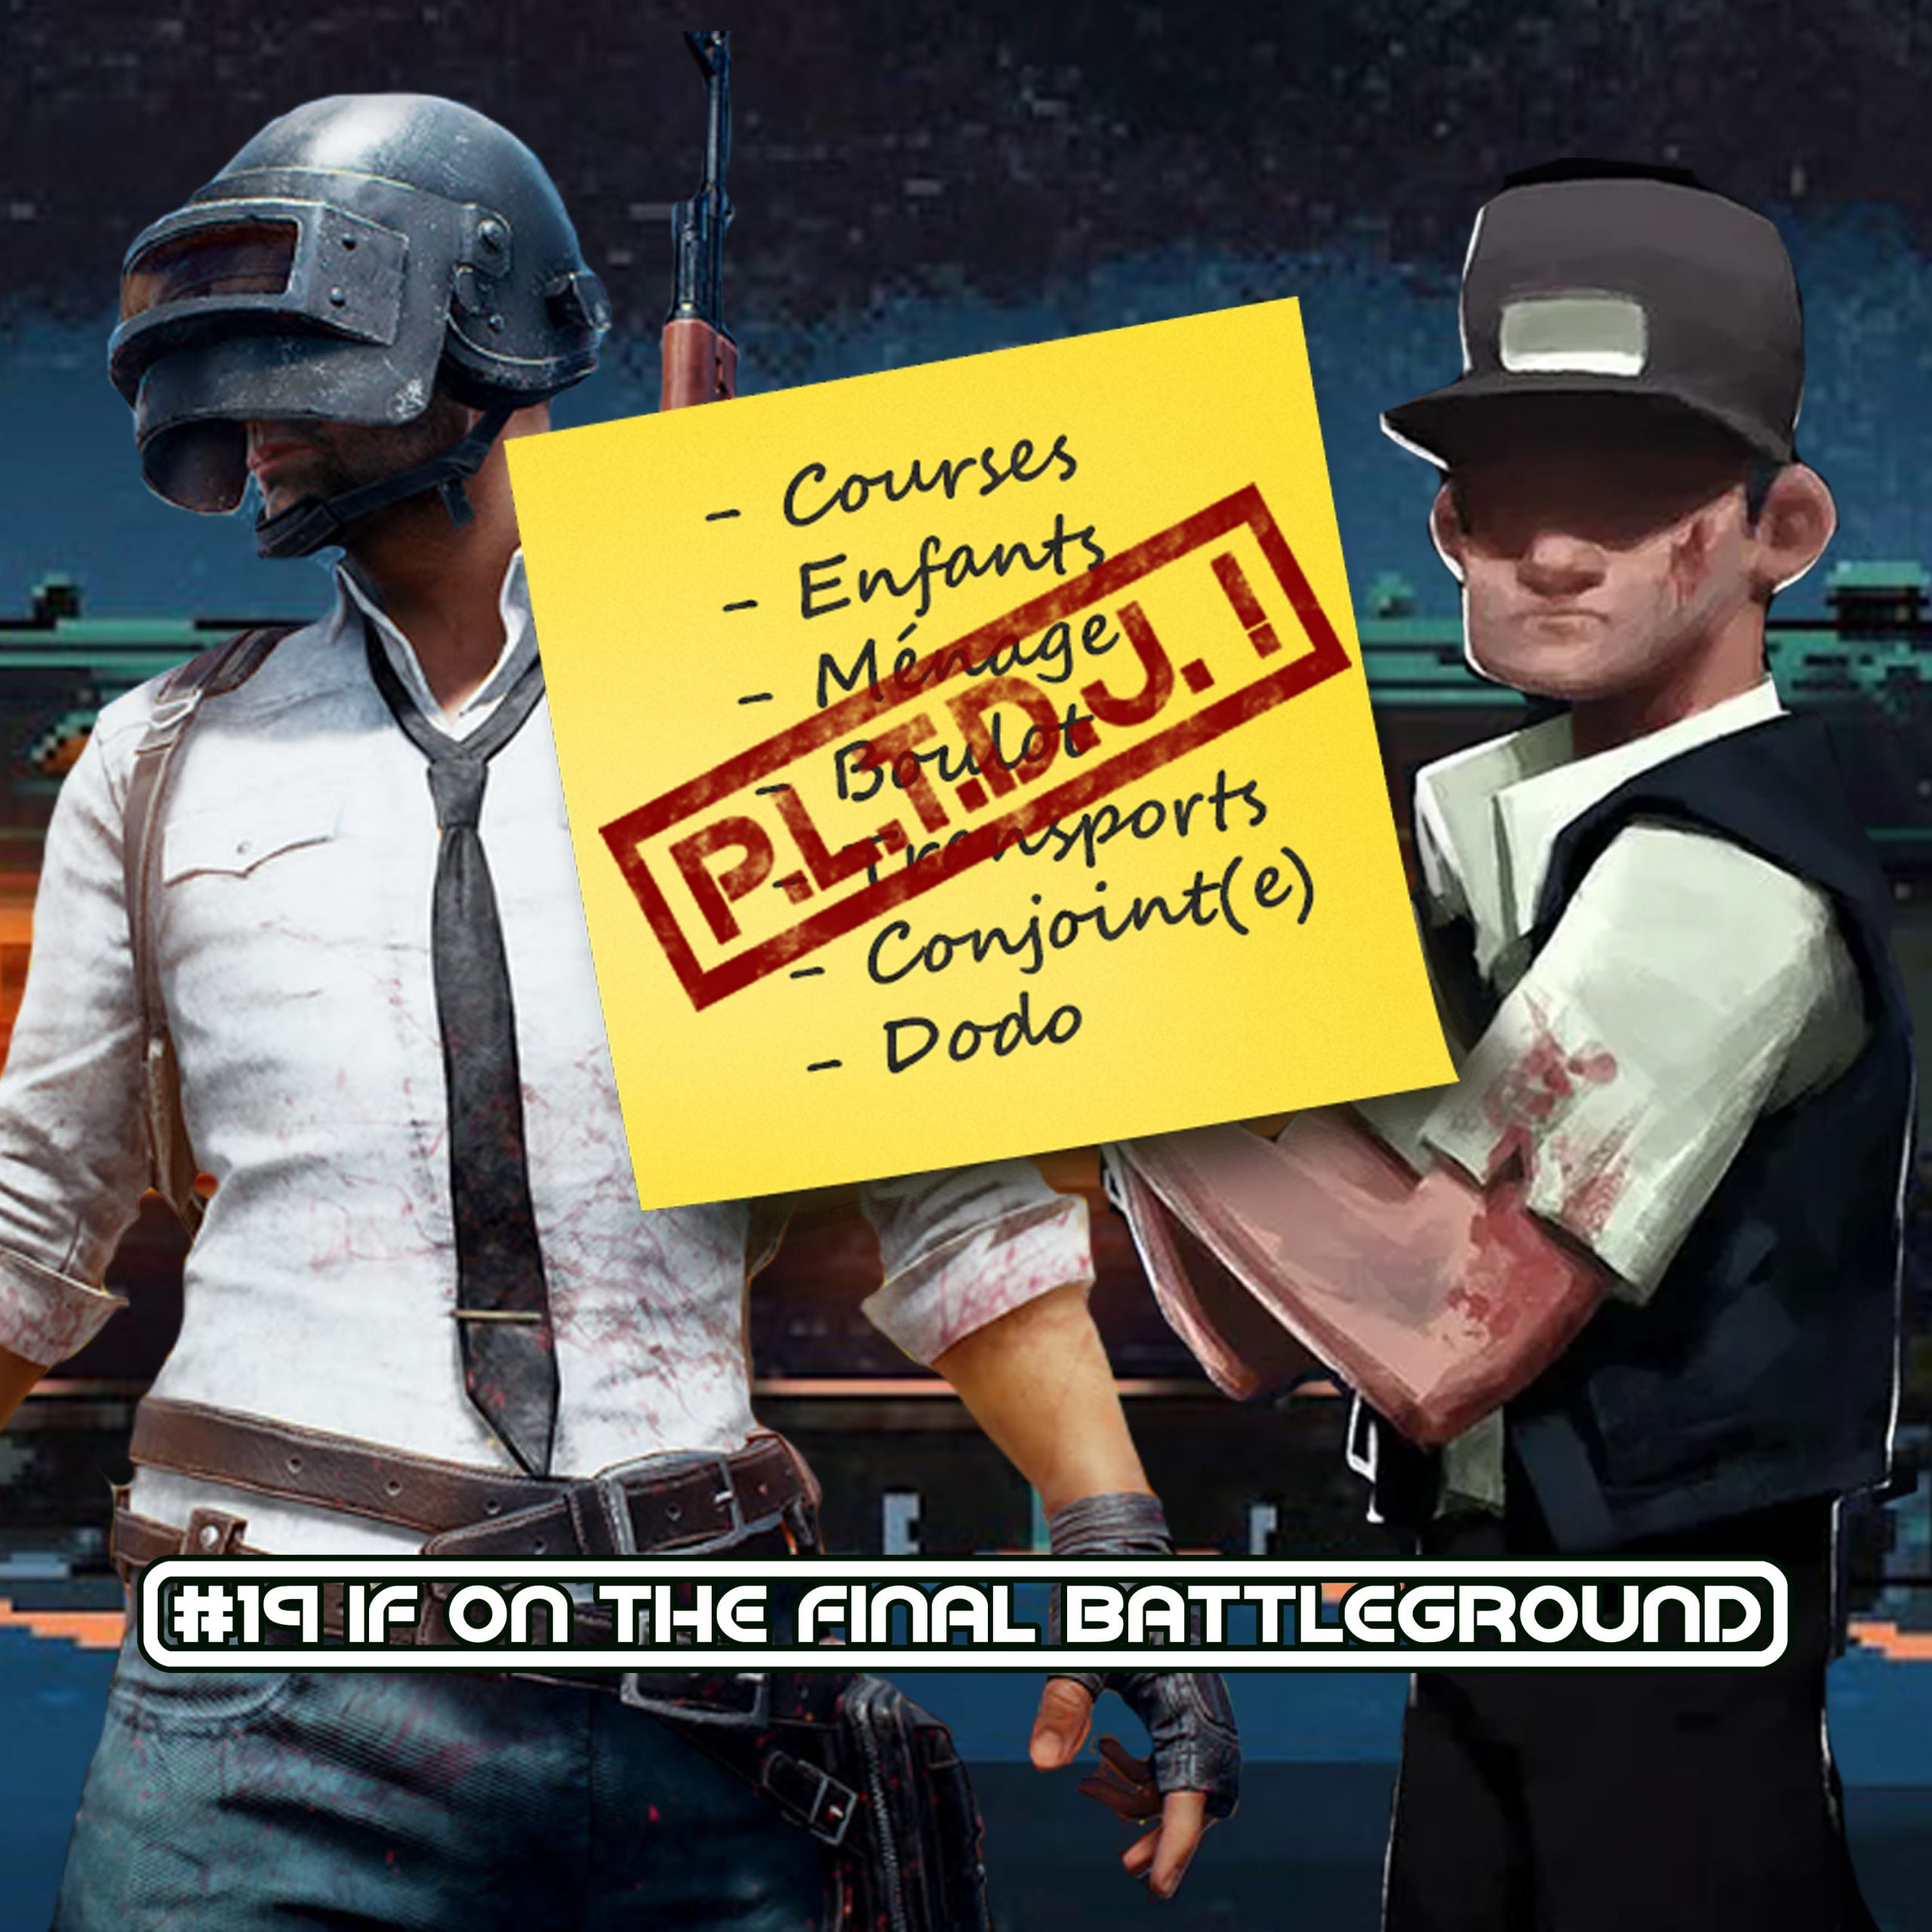 If, on the final Battleground